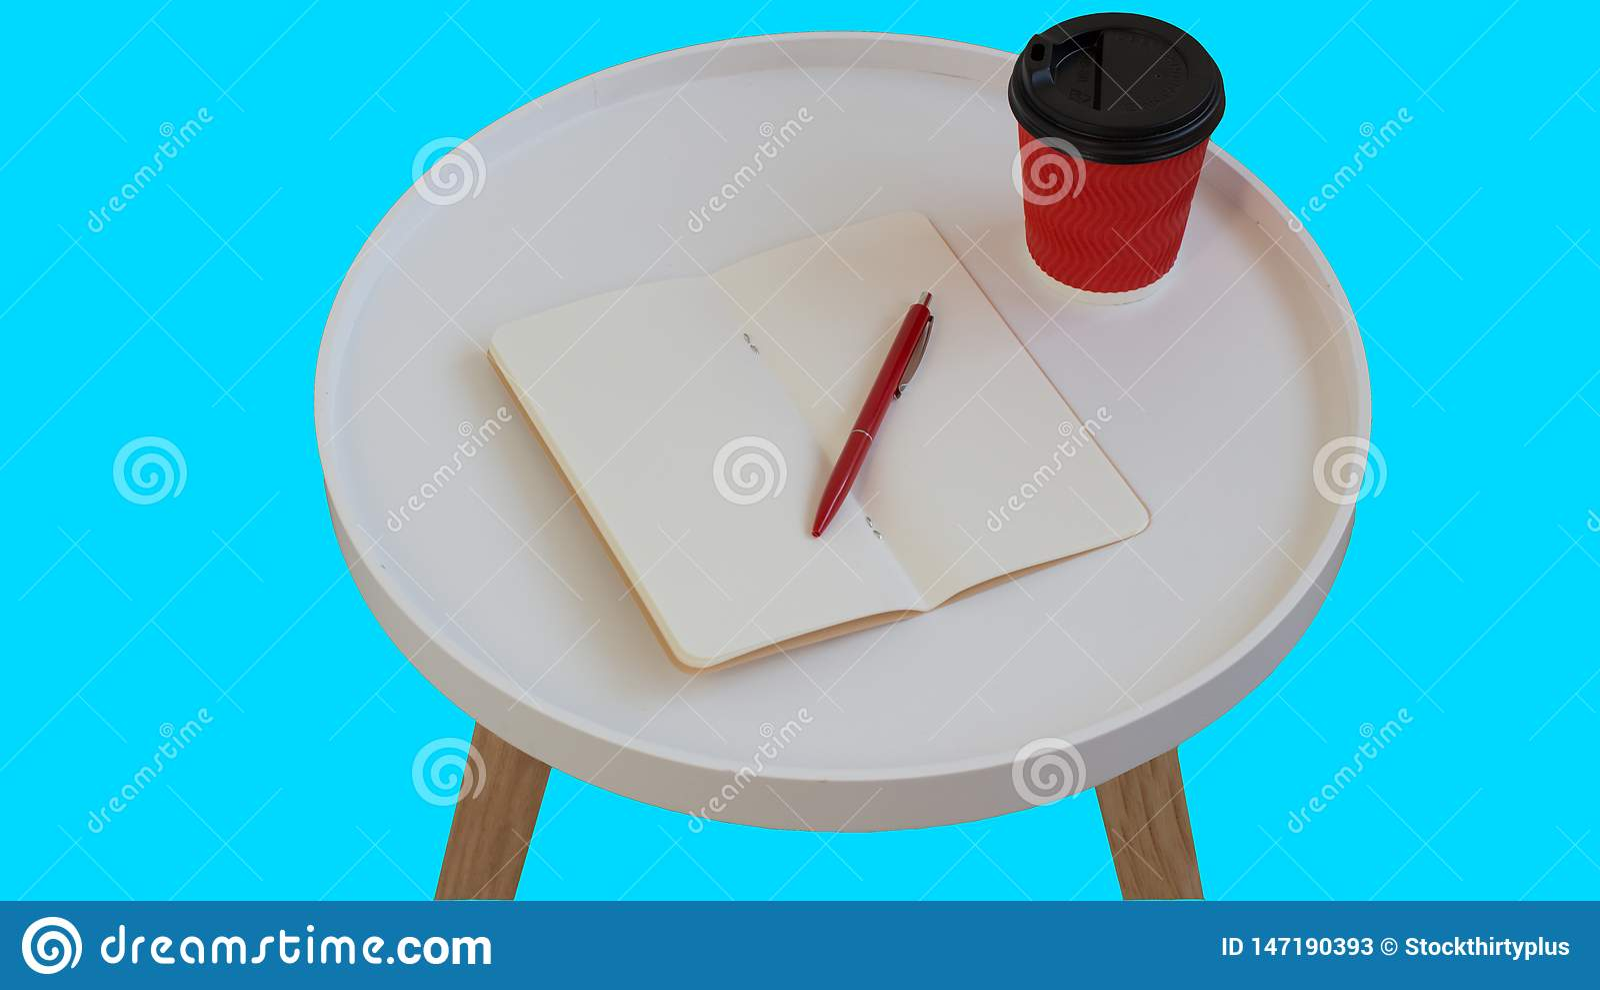 ?ppet tomt tomt anm?rkningspapper med den r?da pennan, den r?da pappkoppen kaffe som g?r p? den vita runda tidskriftstr?tabellen,